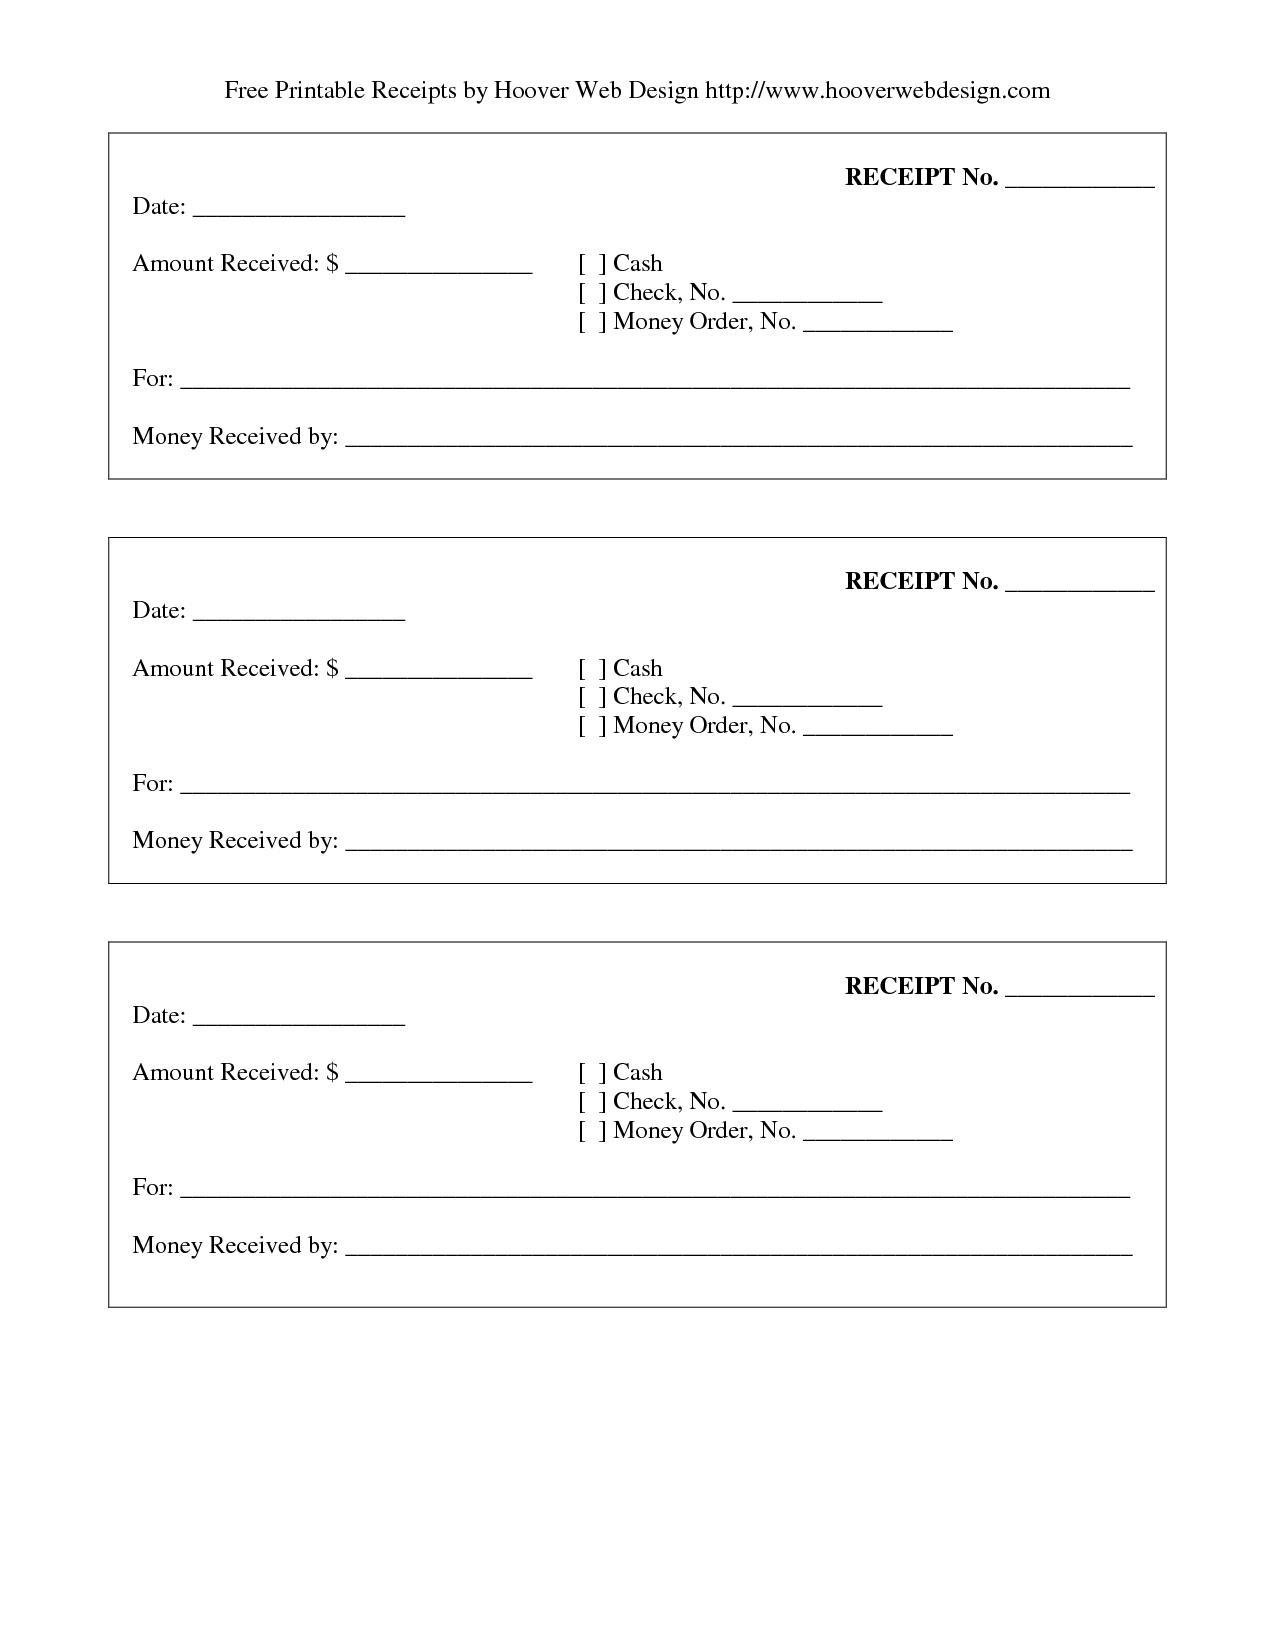 Free Receipt Template Printable